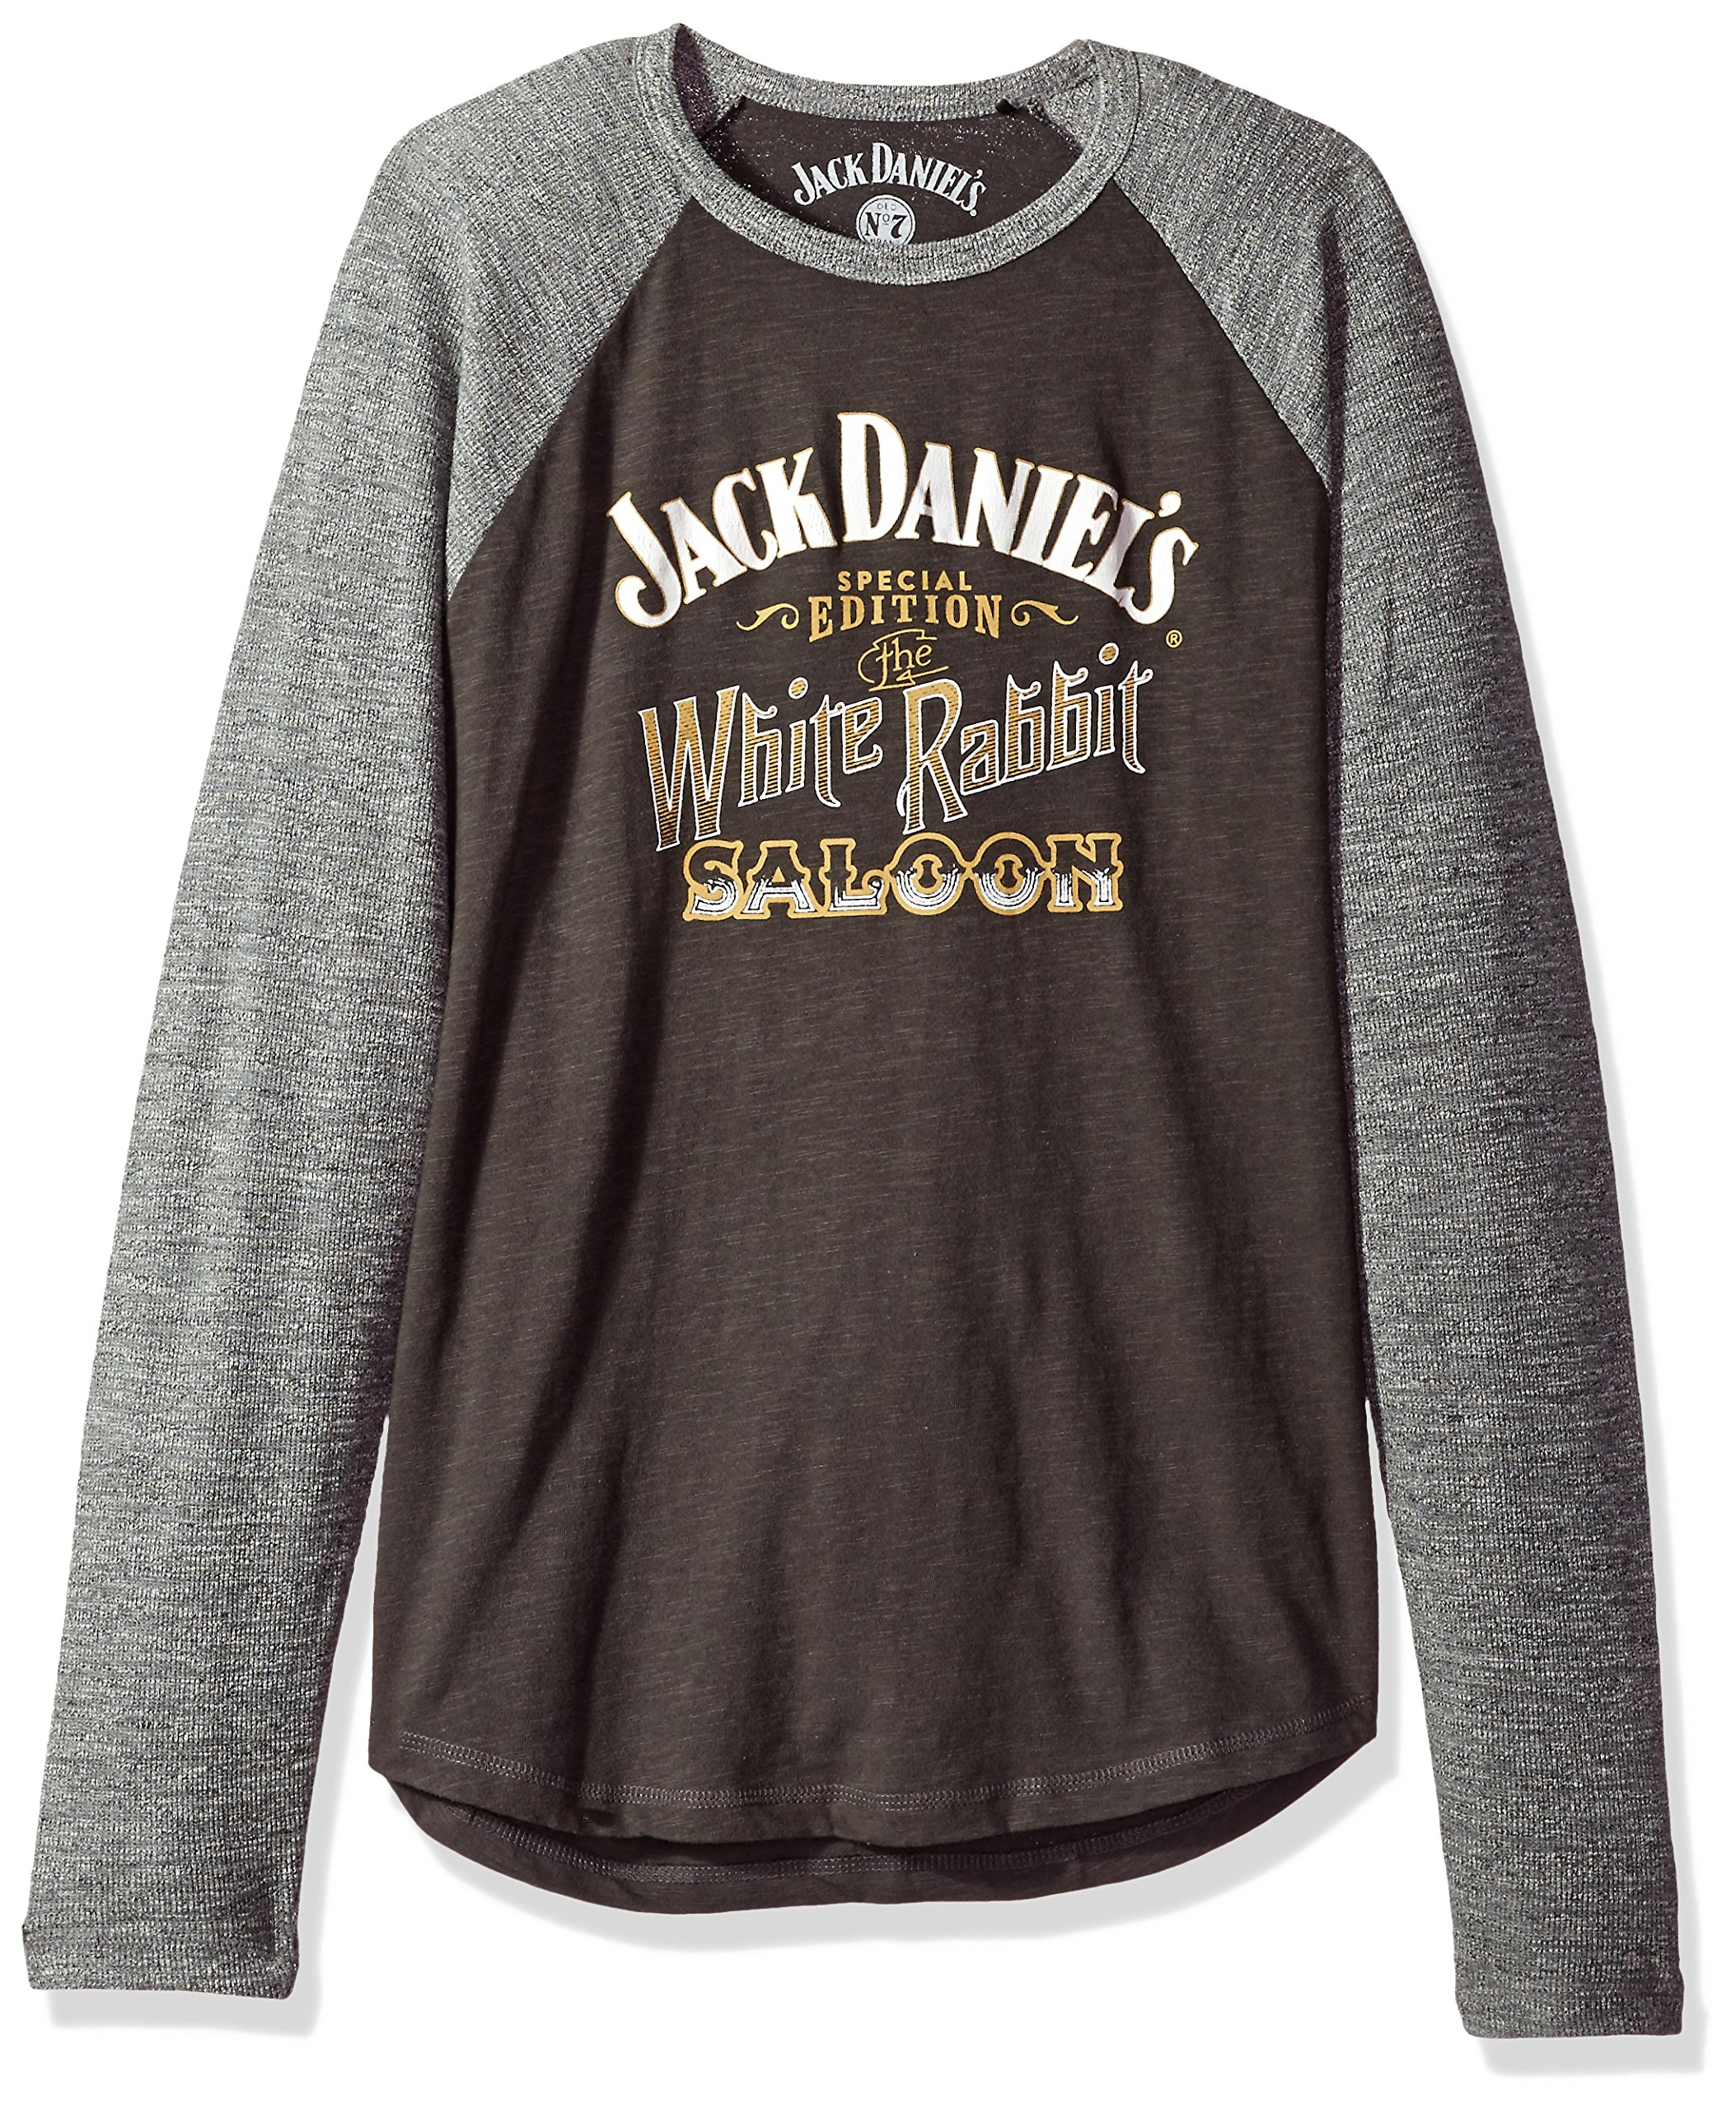 Lucky Brand Men's Jack Daniels White Rabbit Tee, Jet Black/Heather Grey, L